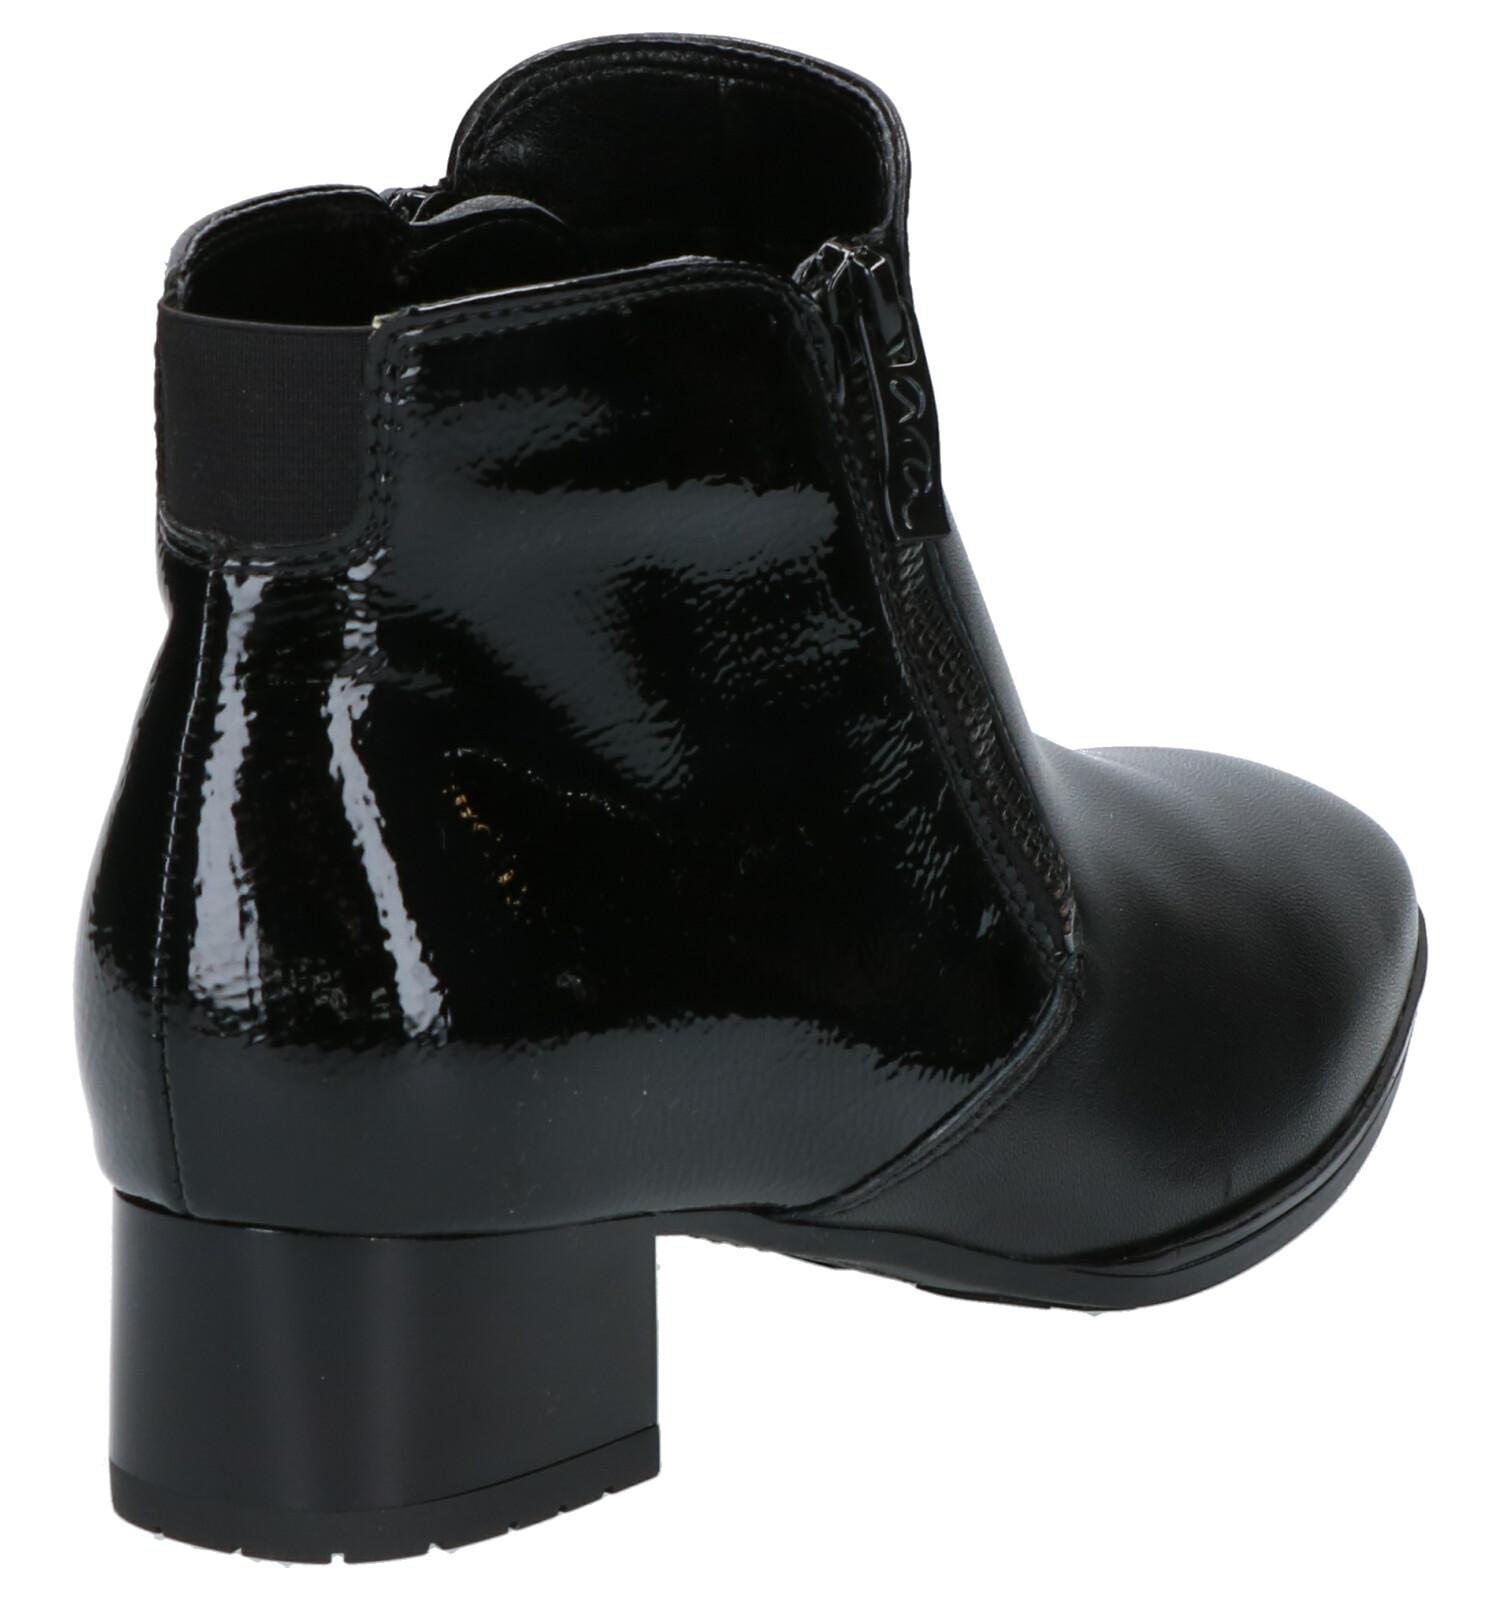 Soft Zwarte Ara Enkellaarzen Ara Ara Zwarte High High Soft Enkellaarzen KFJcl1